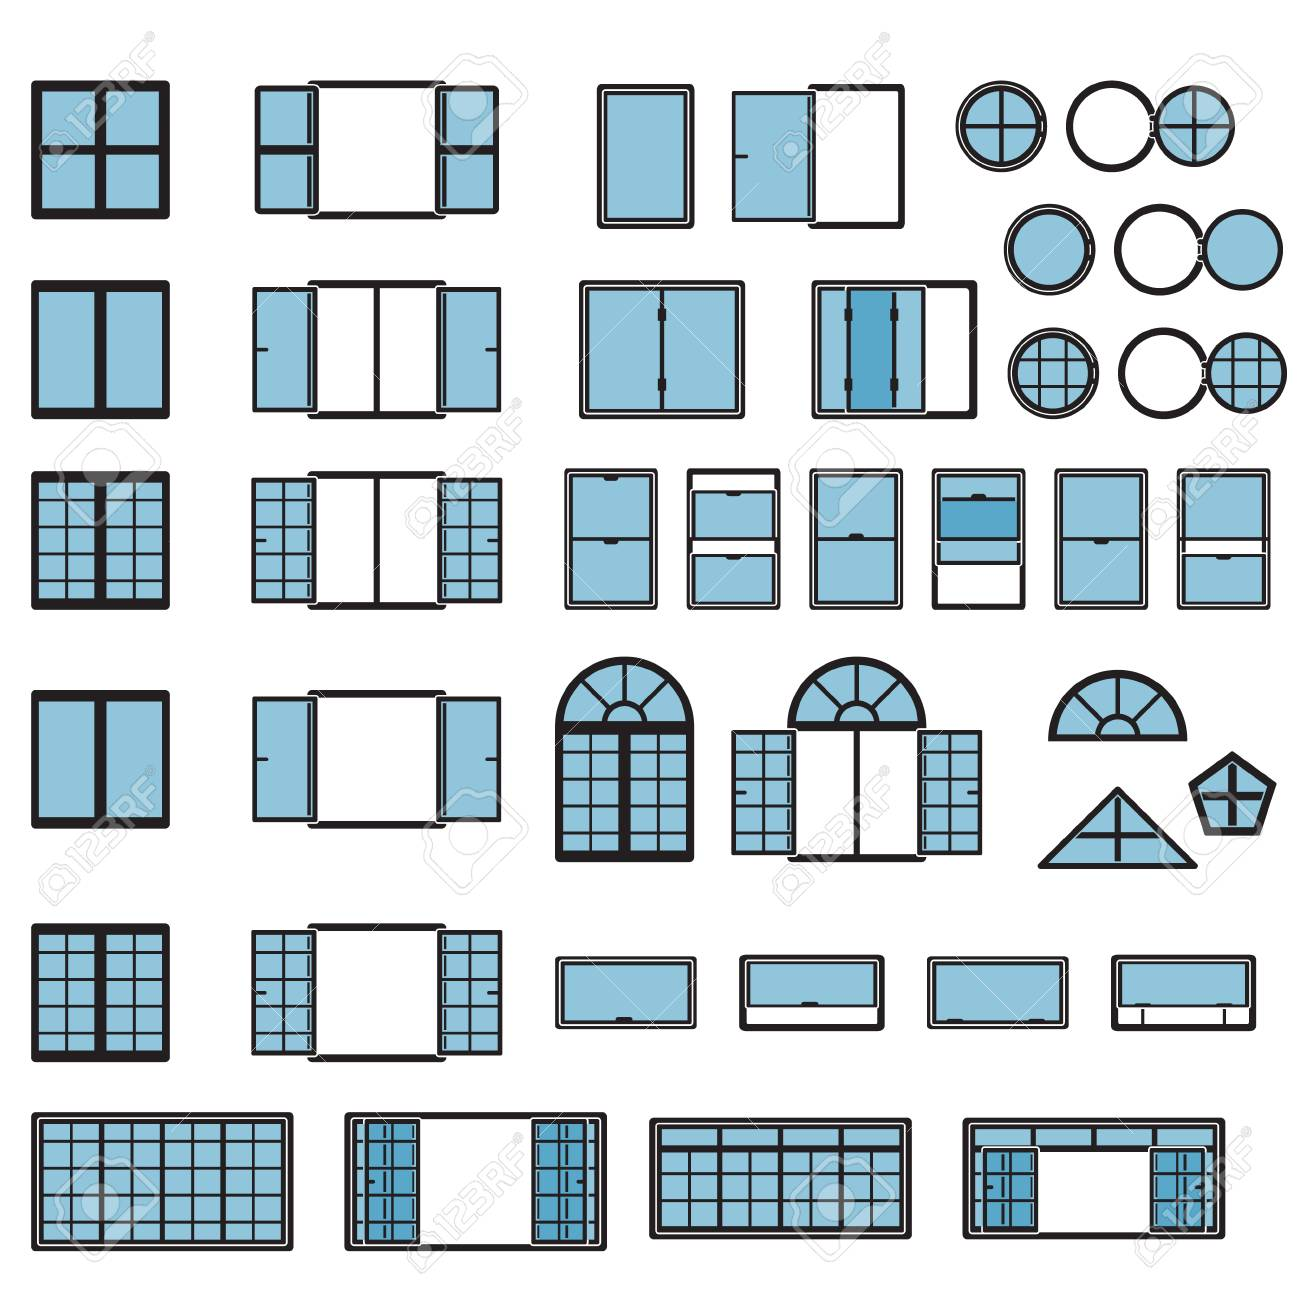 Windows icon set. Window types set. Vector. - 104303045